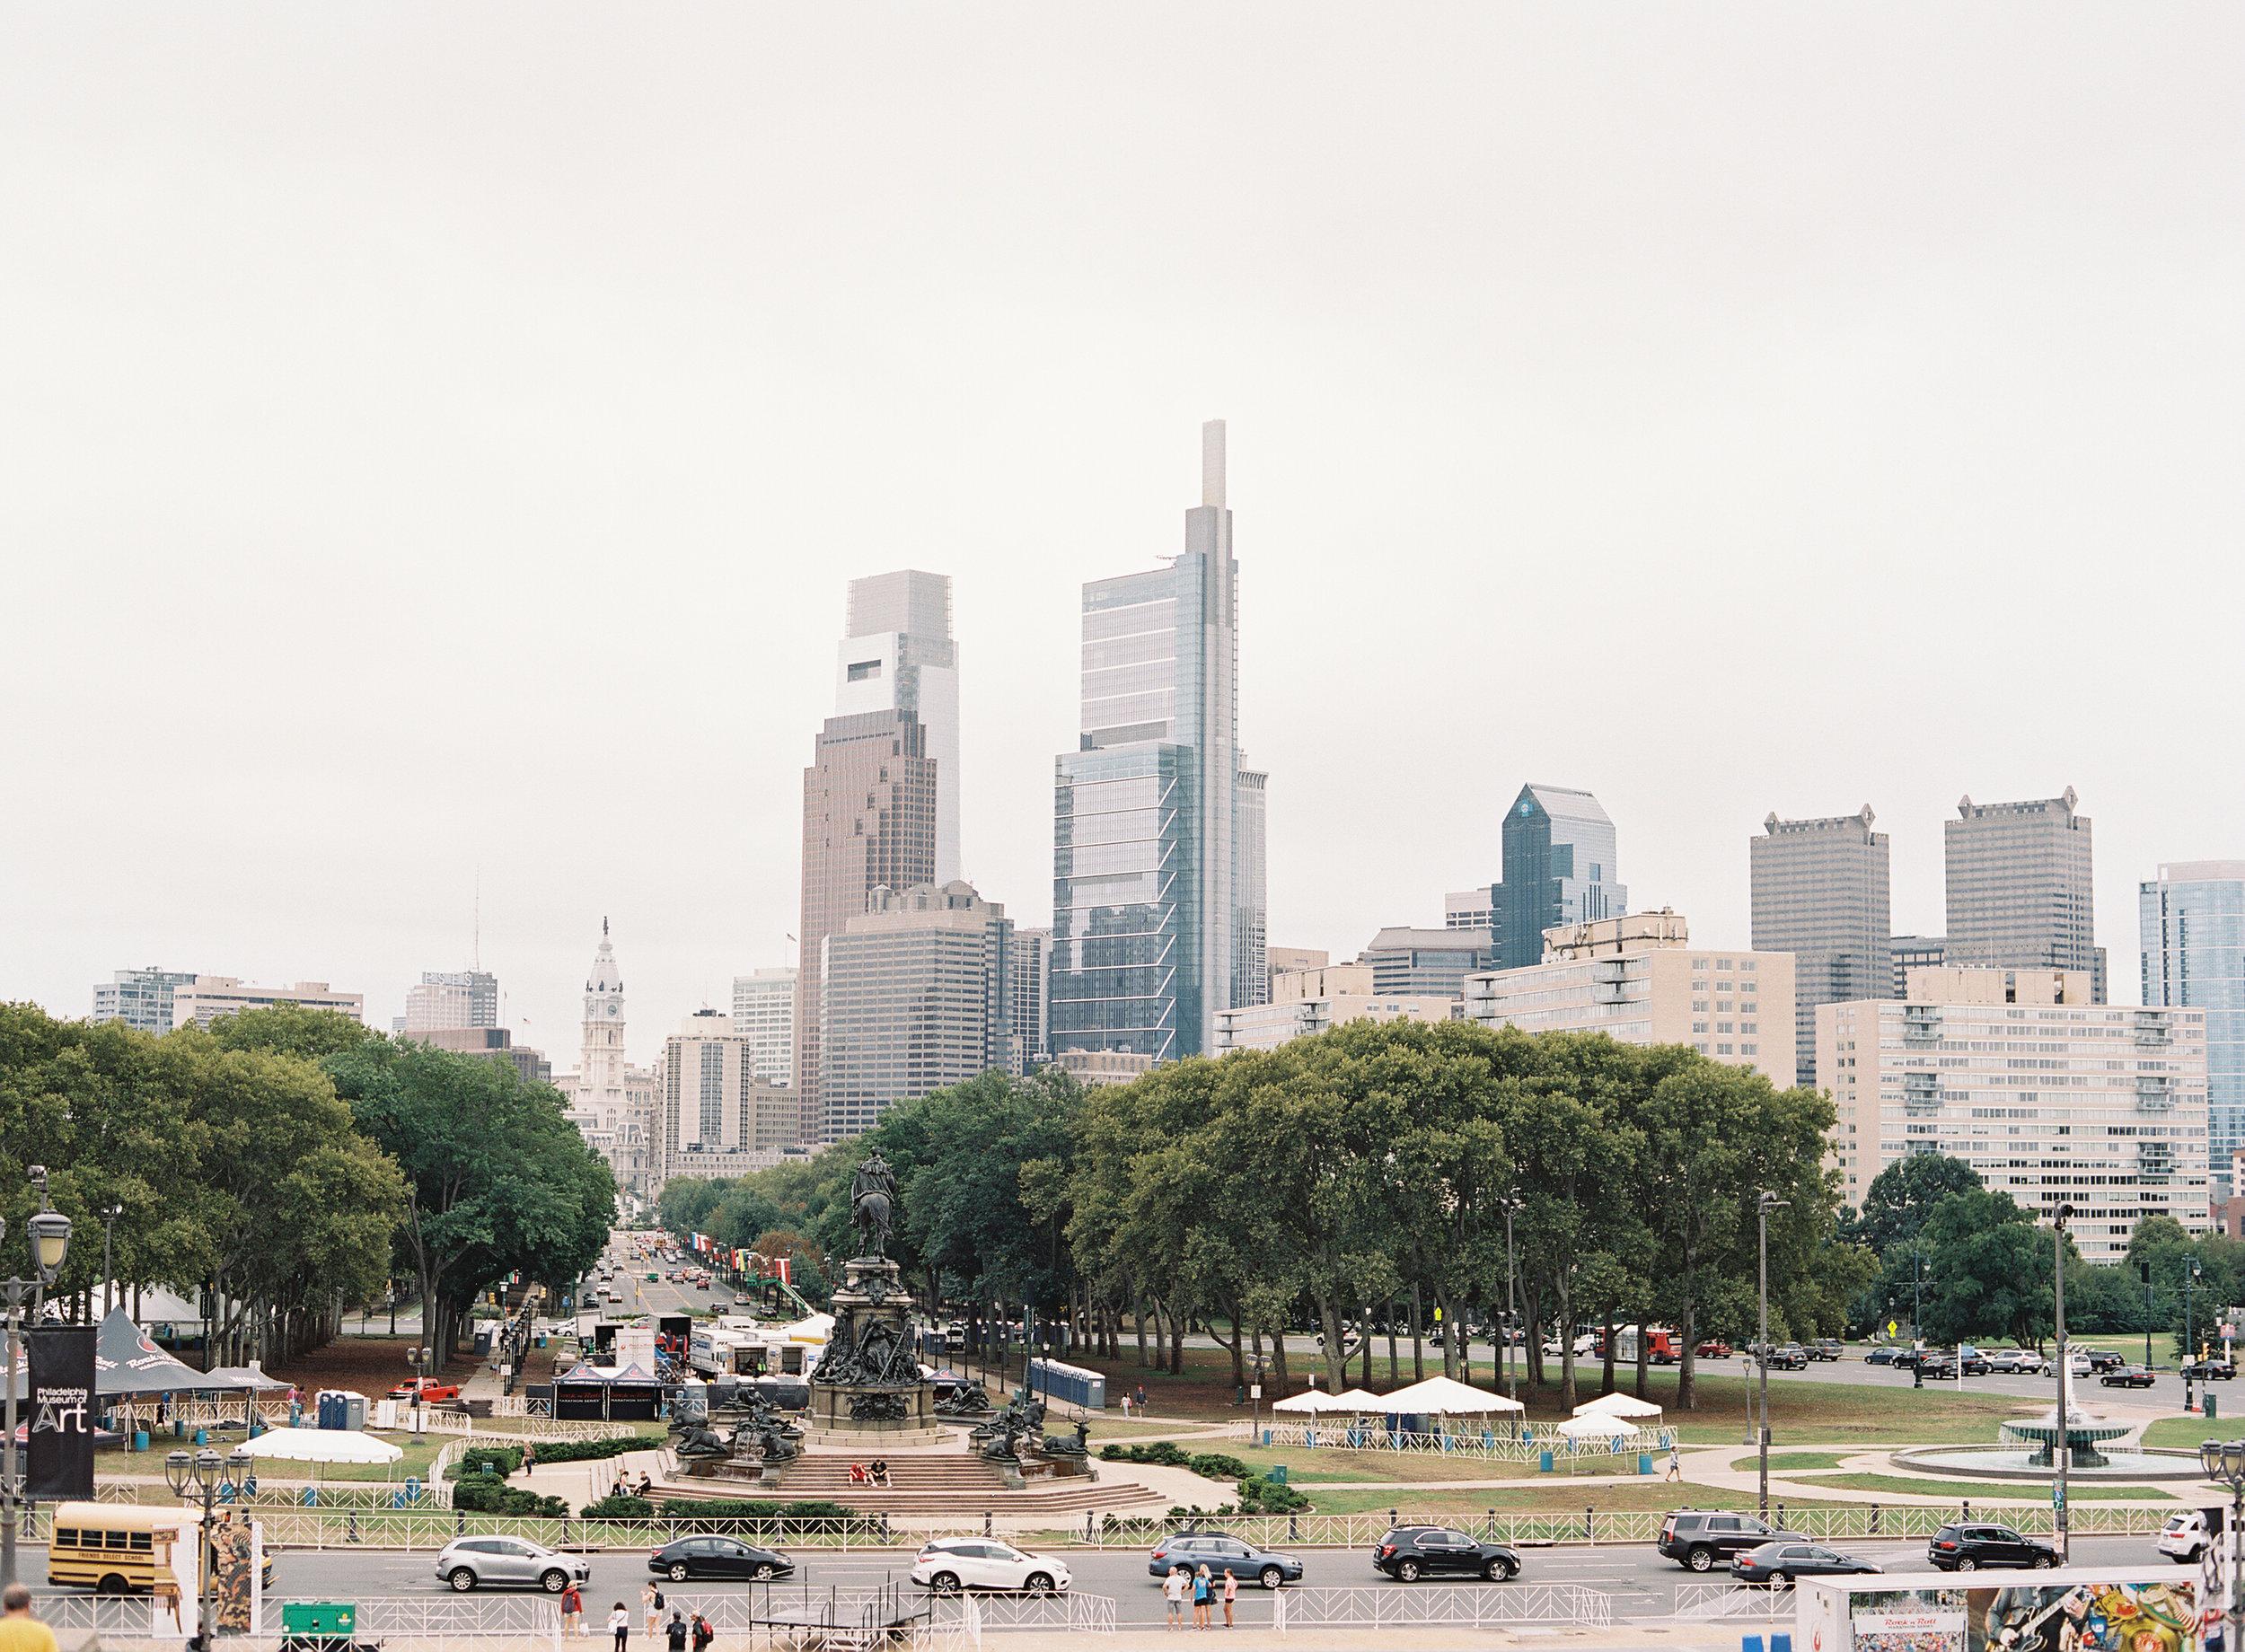 Philly-5.jpg